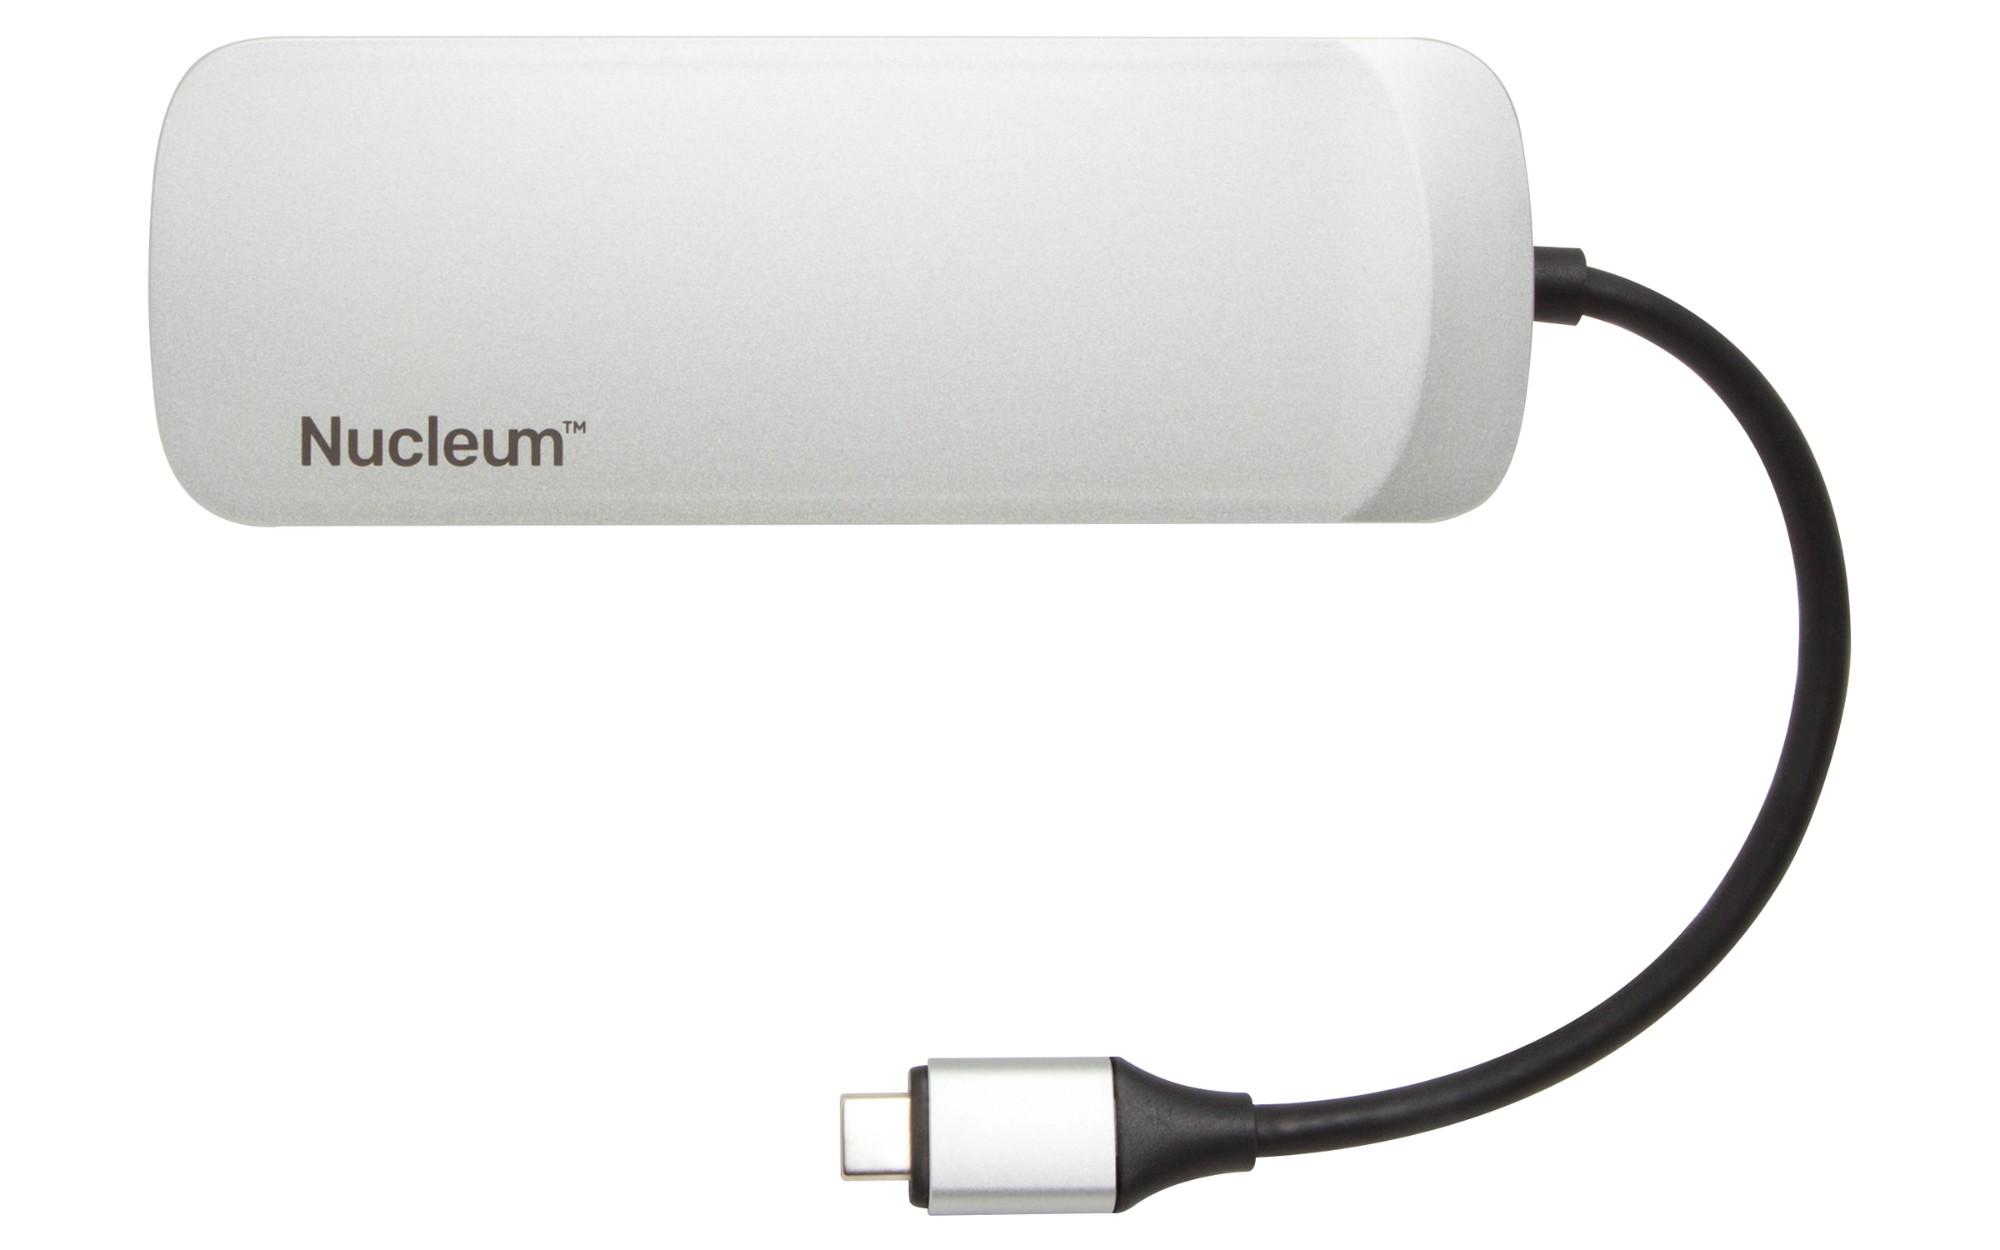 Kingston Technology Nucleum USB 3.0 (3.1 Gen 1) Type-C 5000 Mbit/s Silver